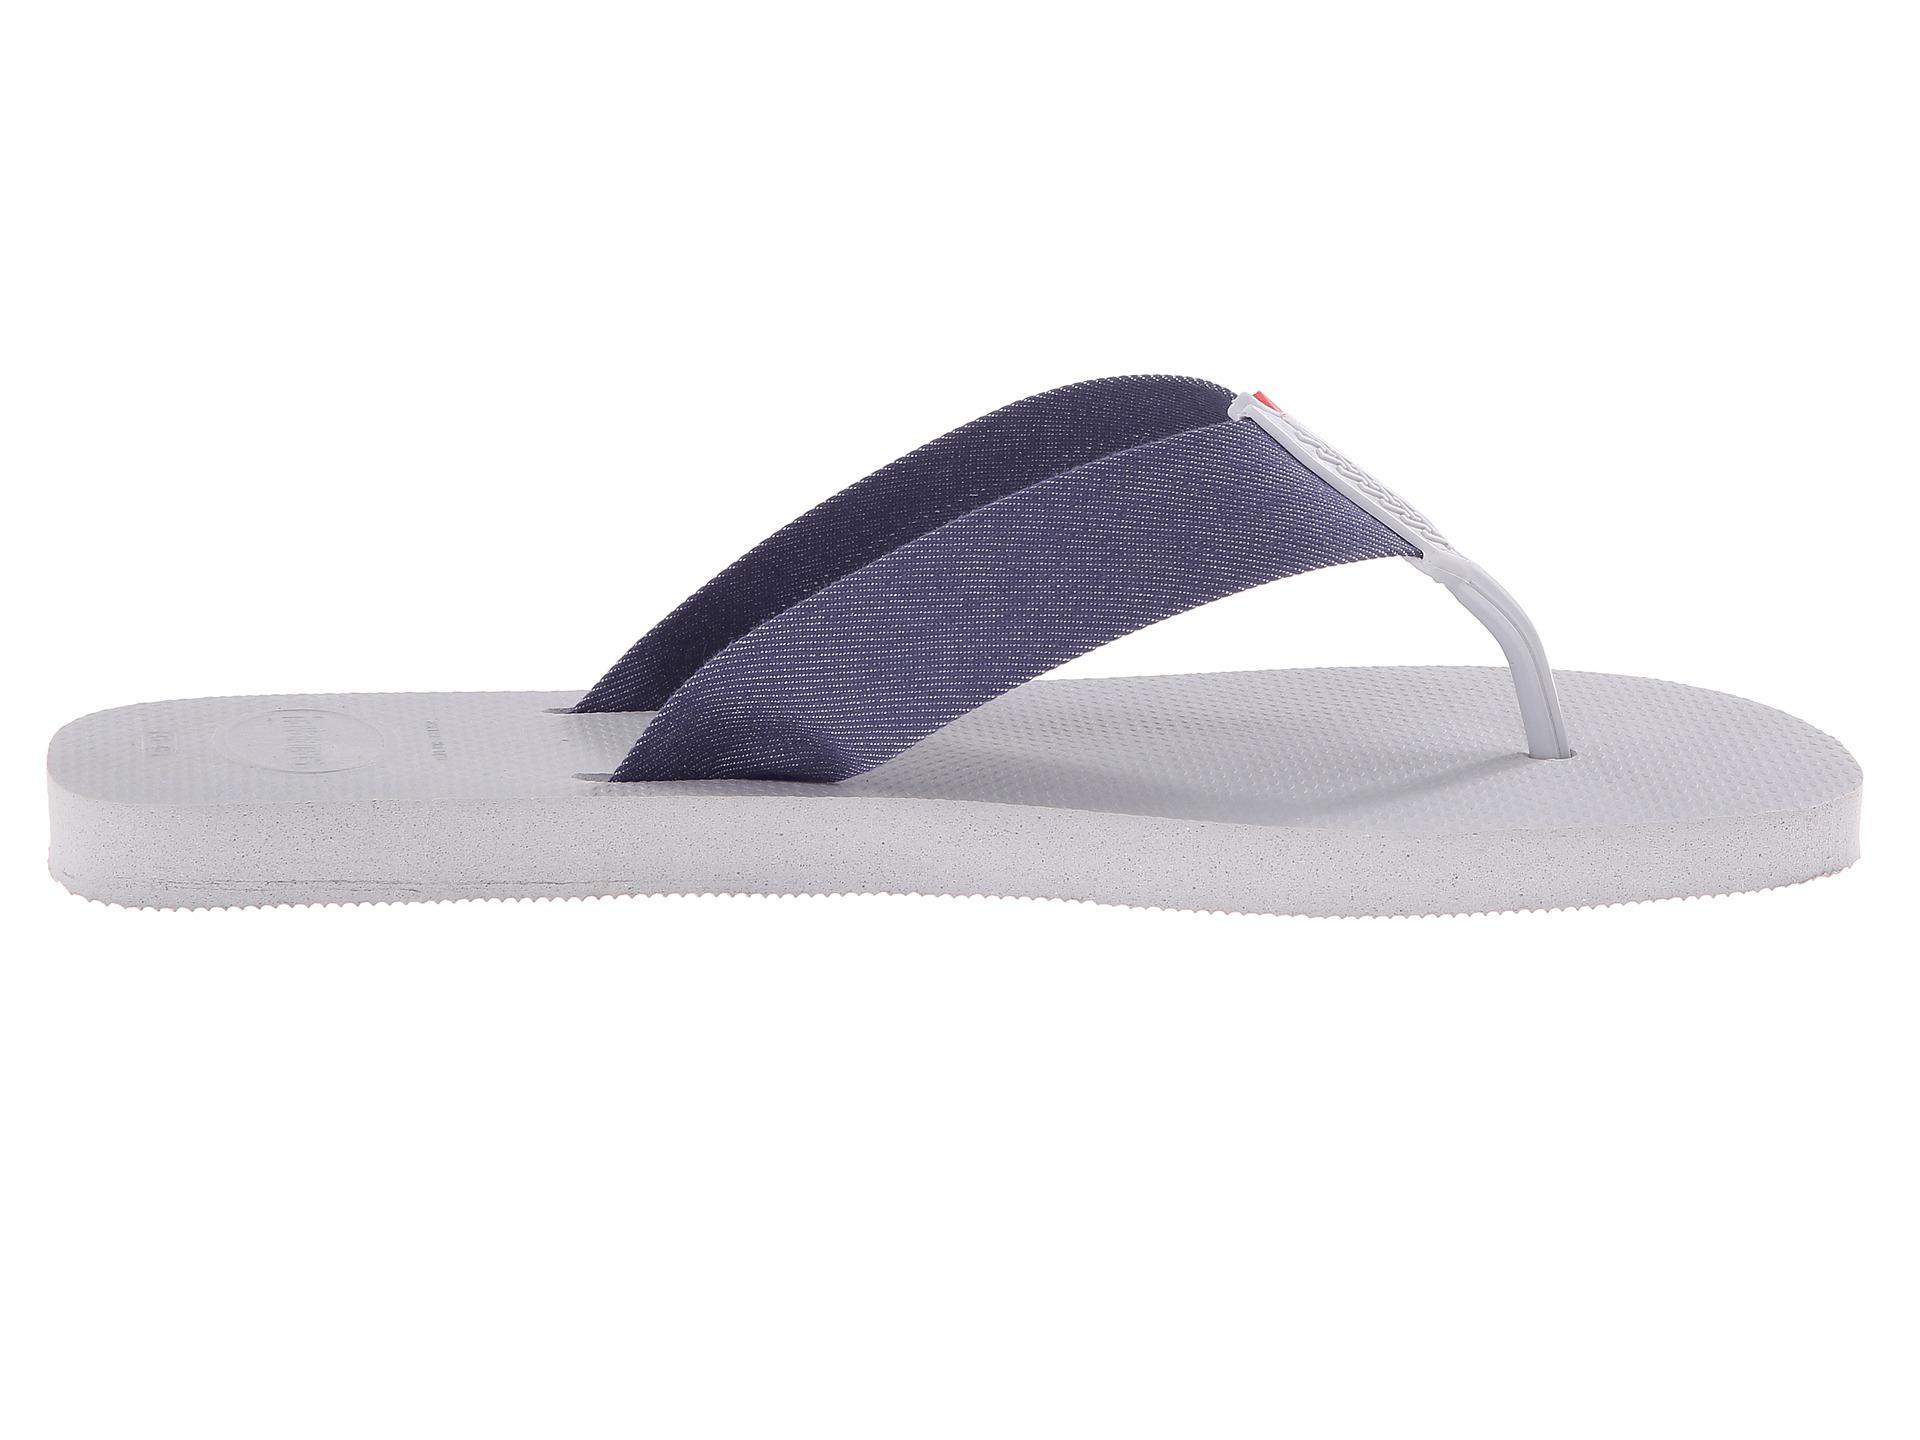 140d8d48842080 Lyst - Havaianas Urban Series Flip Flops in Blue for Men